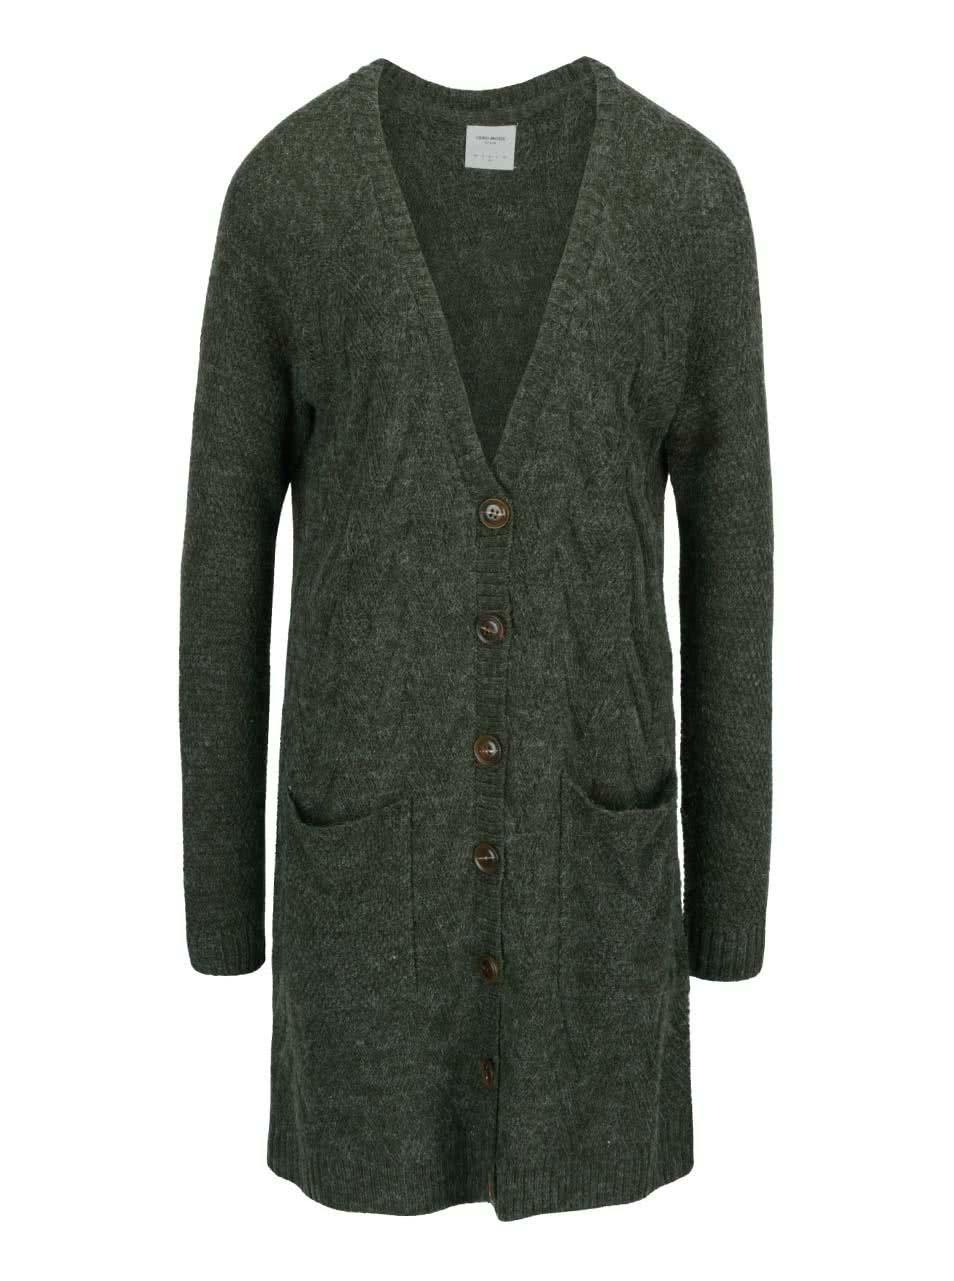 Khaki dlouhý cardigan s kapsami Vero Moda Joya LS